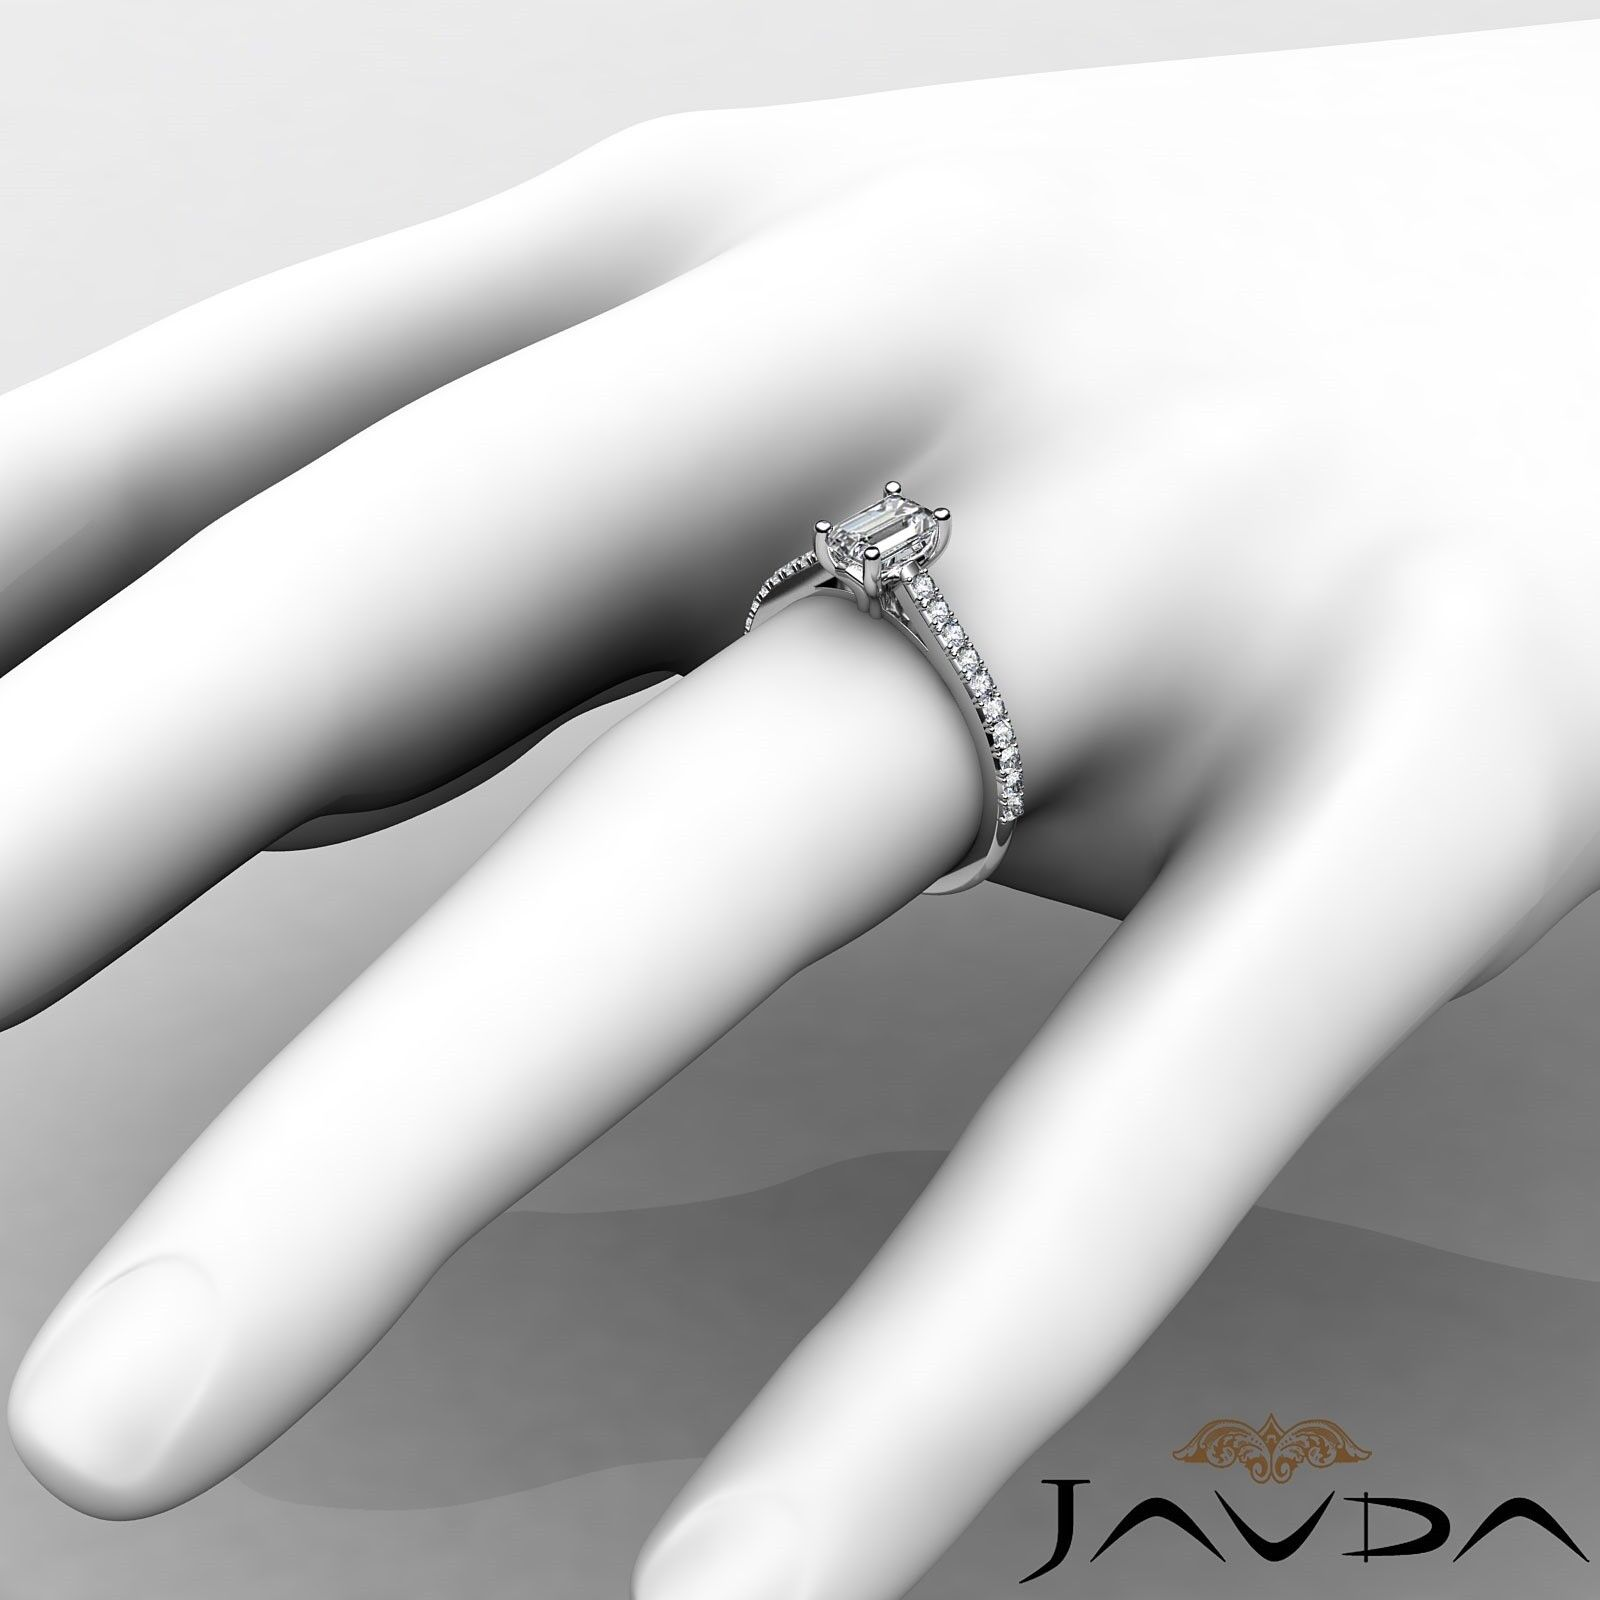 0.82ctw Classic Prong Set Emerald Diamond Engagement Ring GIA G-VVS2 White Gold 2